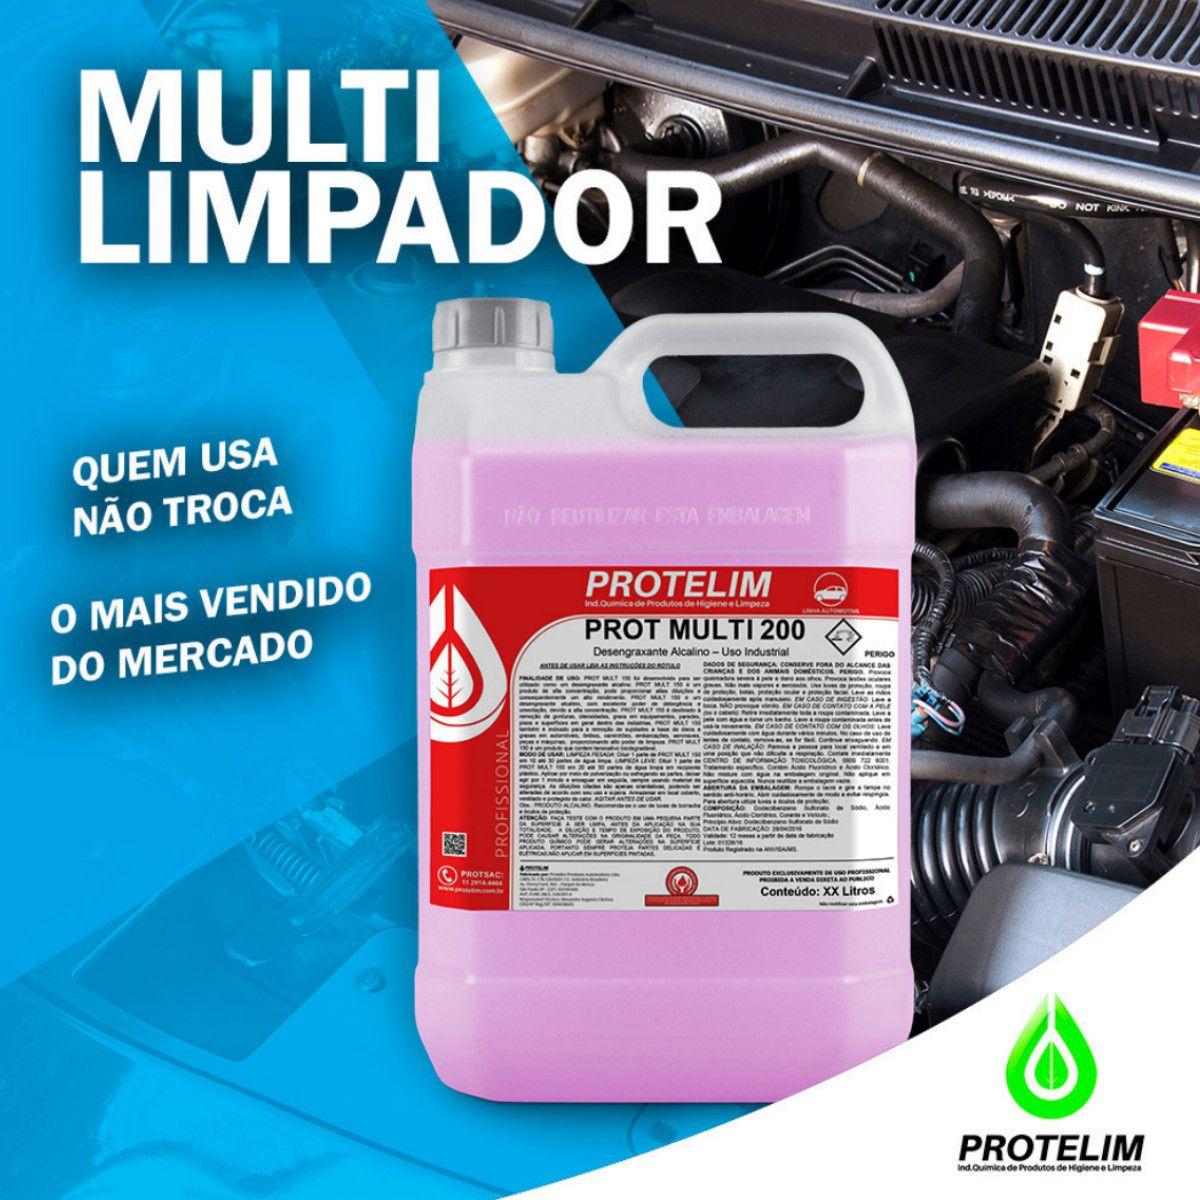 Prot Mult 200 + Pincel Cabo Longo Para Limpeza Automotiva 2